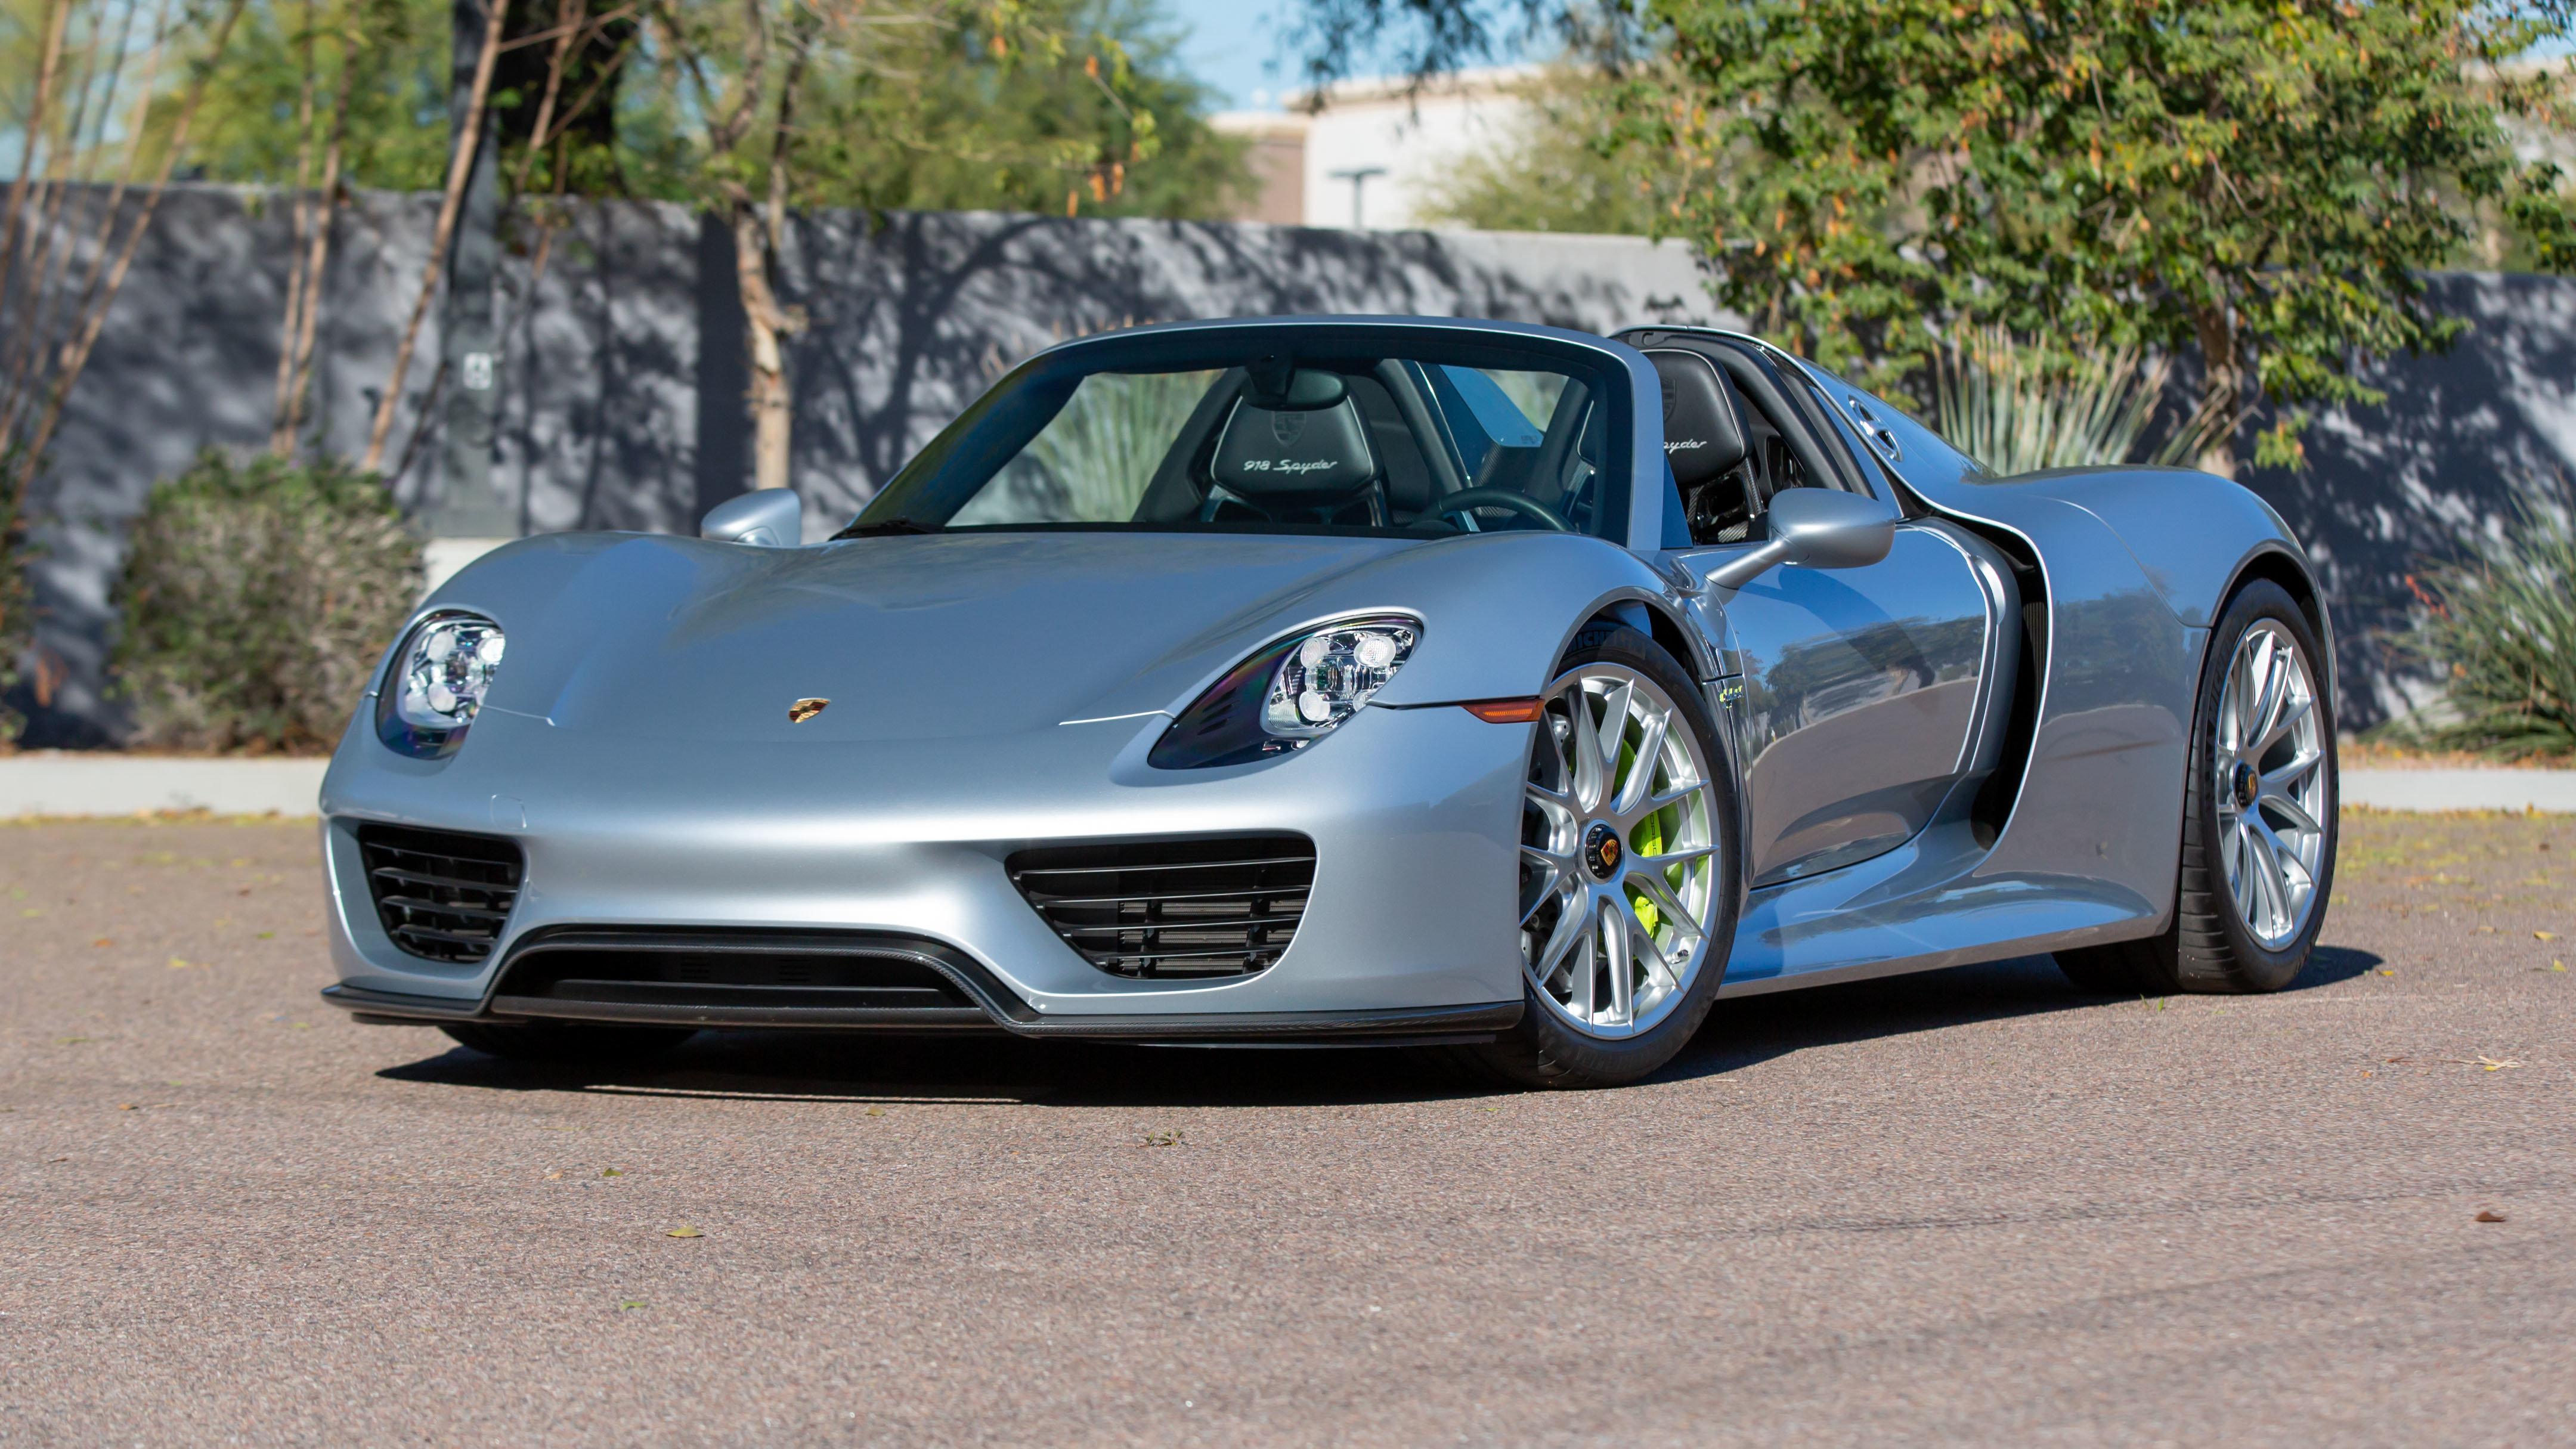 2015 Porsche 918 Spyder 4.6L:887 HP, 3,571 Miles (Lot S94) - Mecum Phoenix